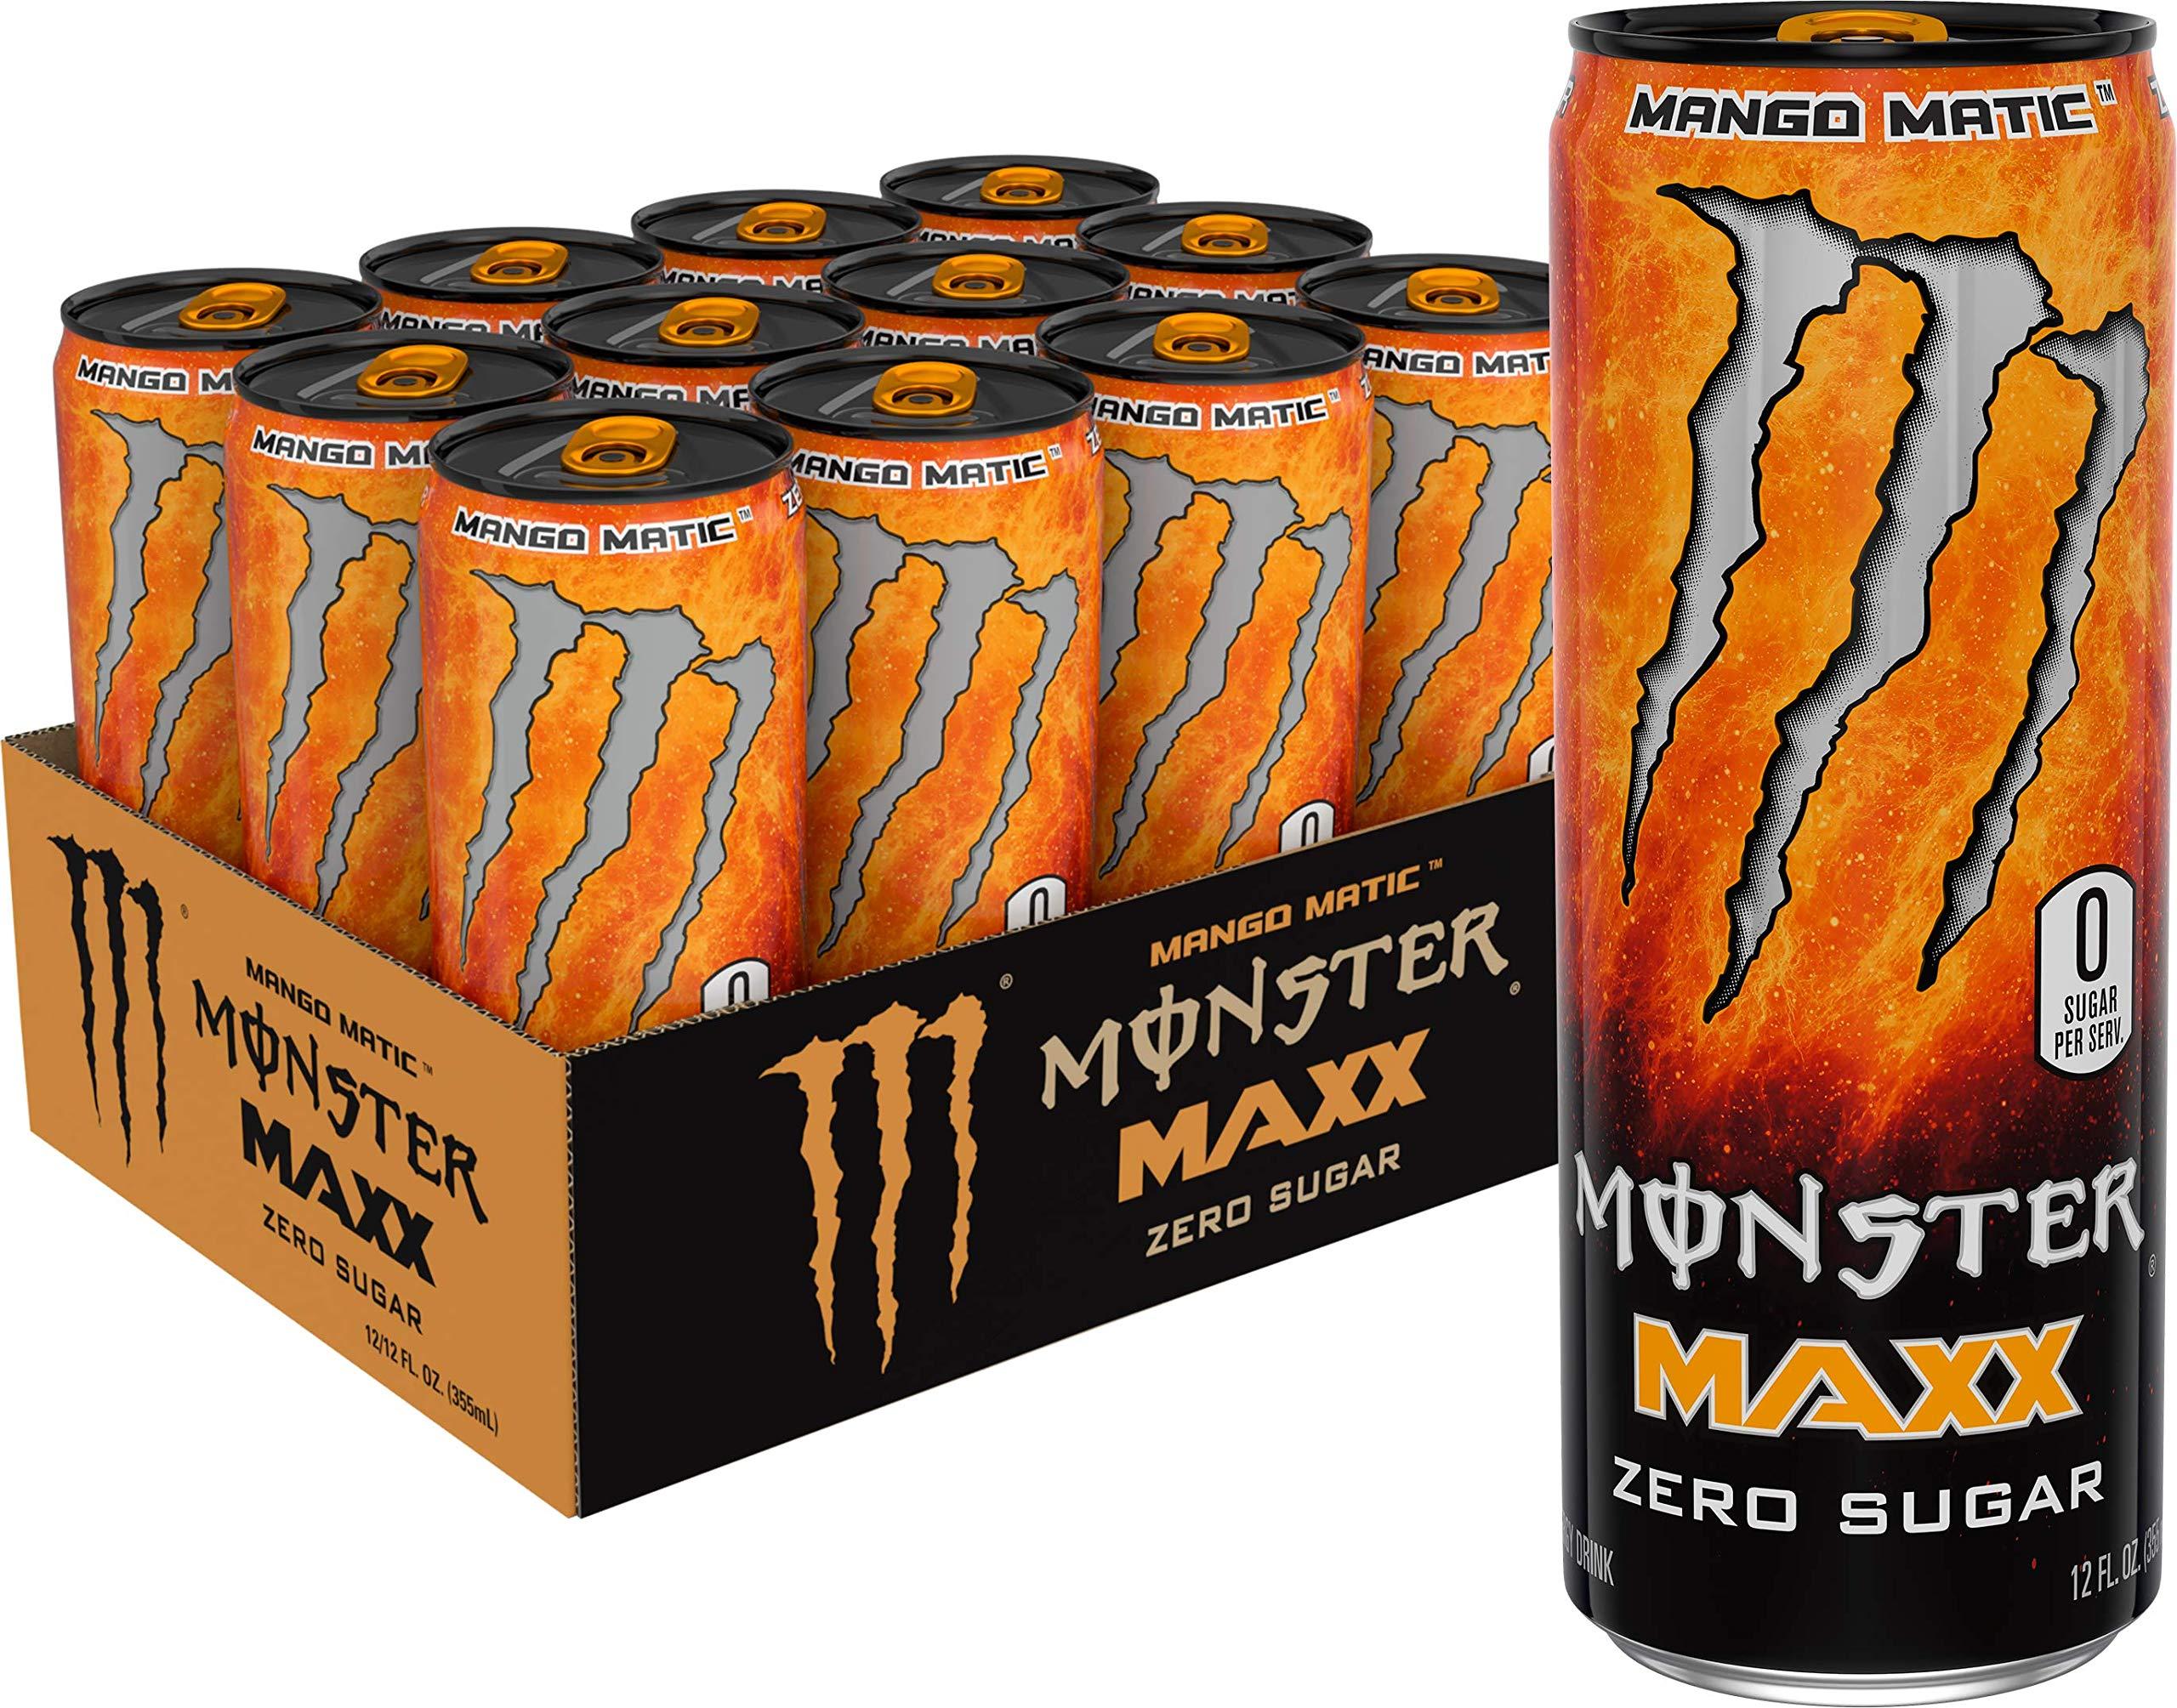 Monster Energy Maxx Mango Matic, Zero Sugar, Energy Drink, 12 Oz (Pack Of 12)